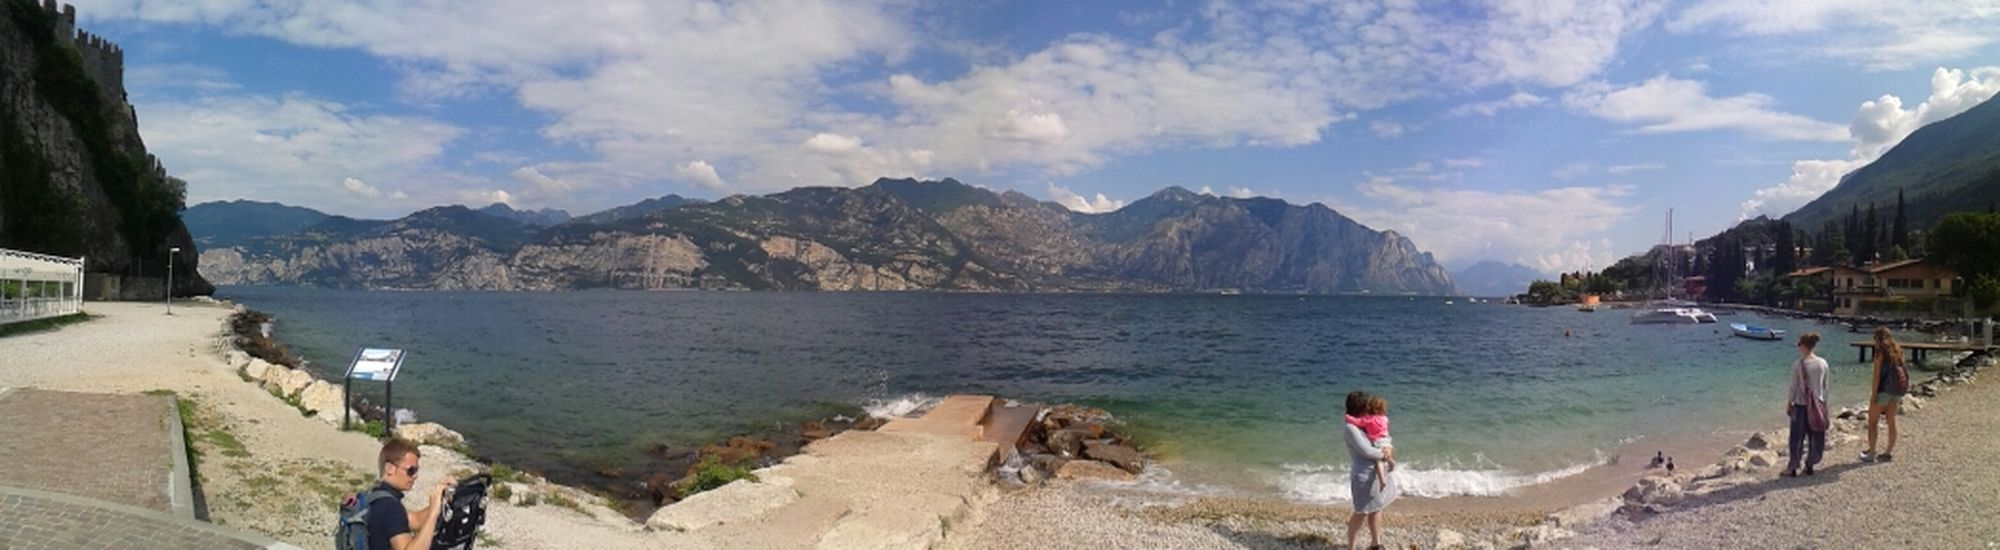 Lago di Garda Amazing View Hello World Beautiful Place Beautiful Places Around The World